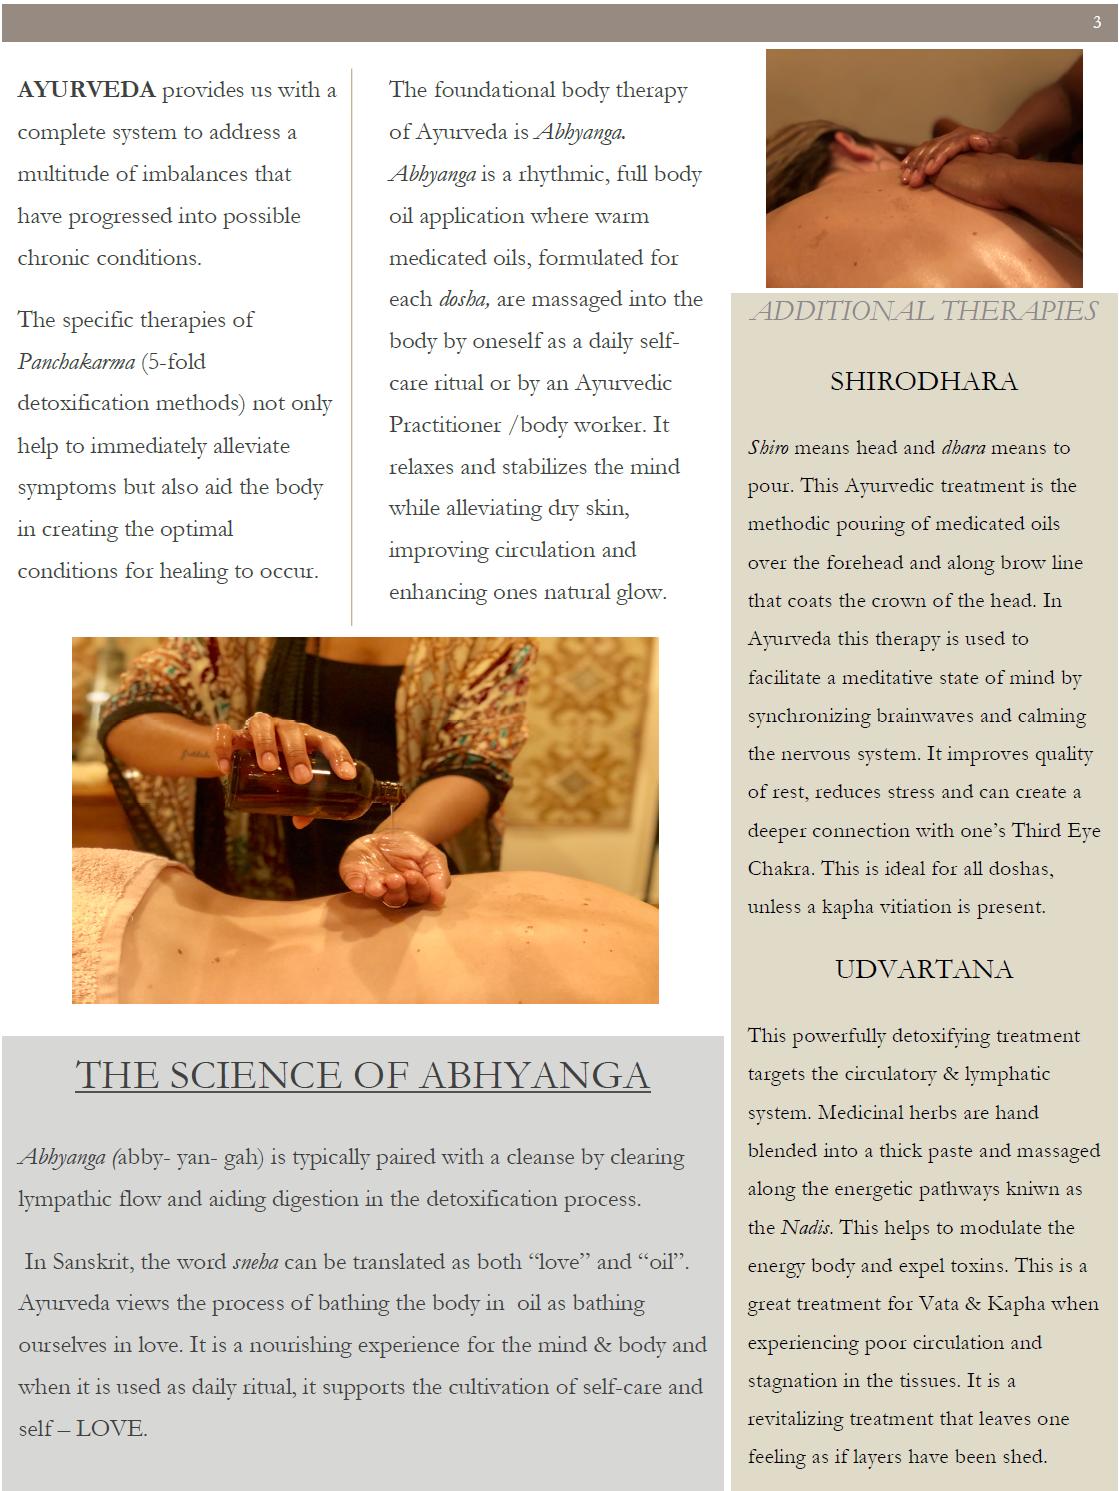 CocoShakti Ayurveda Newsletter Pg3.PNG